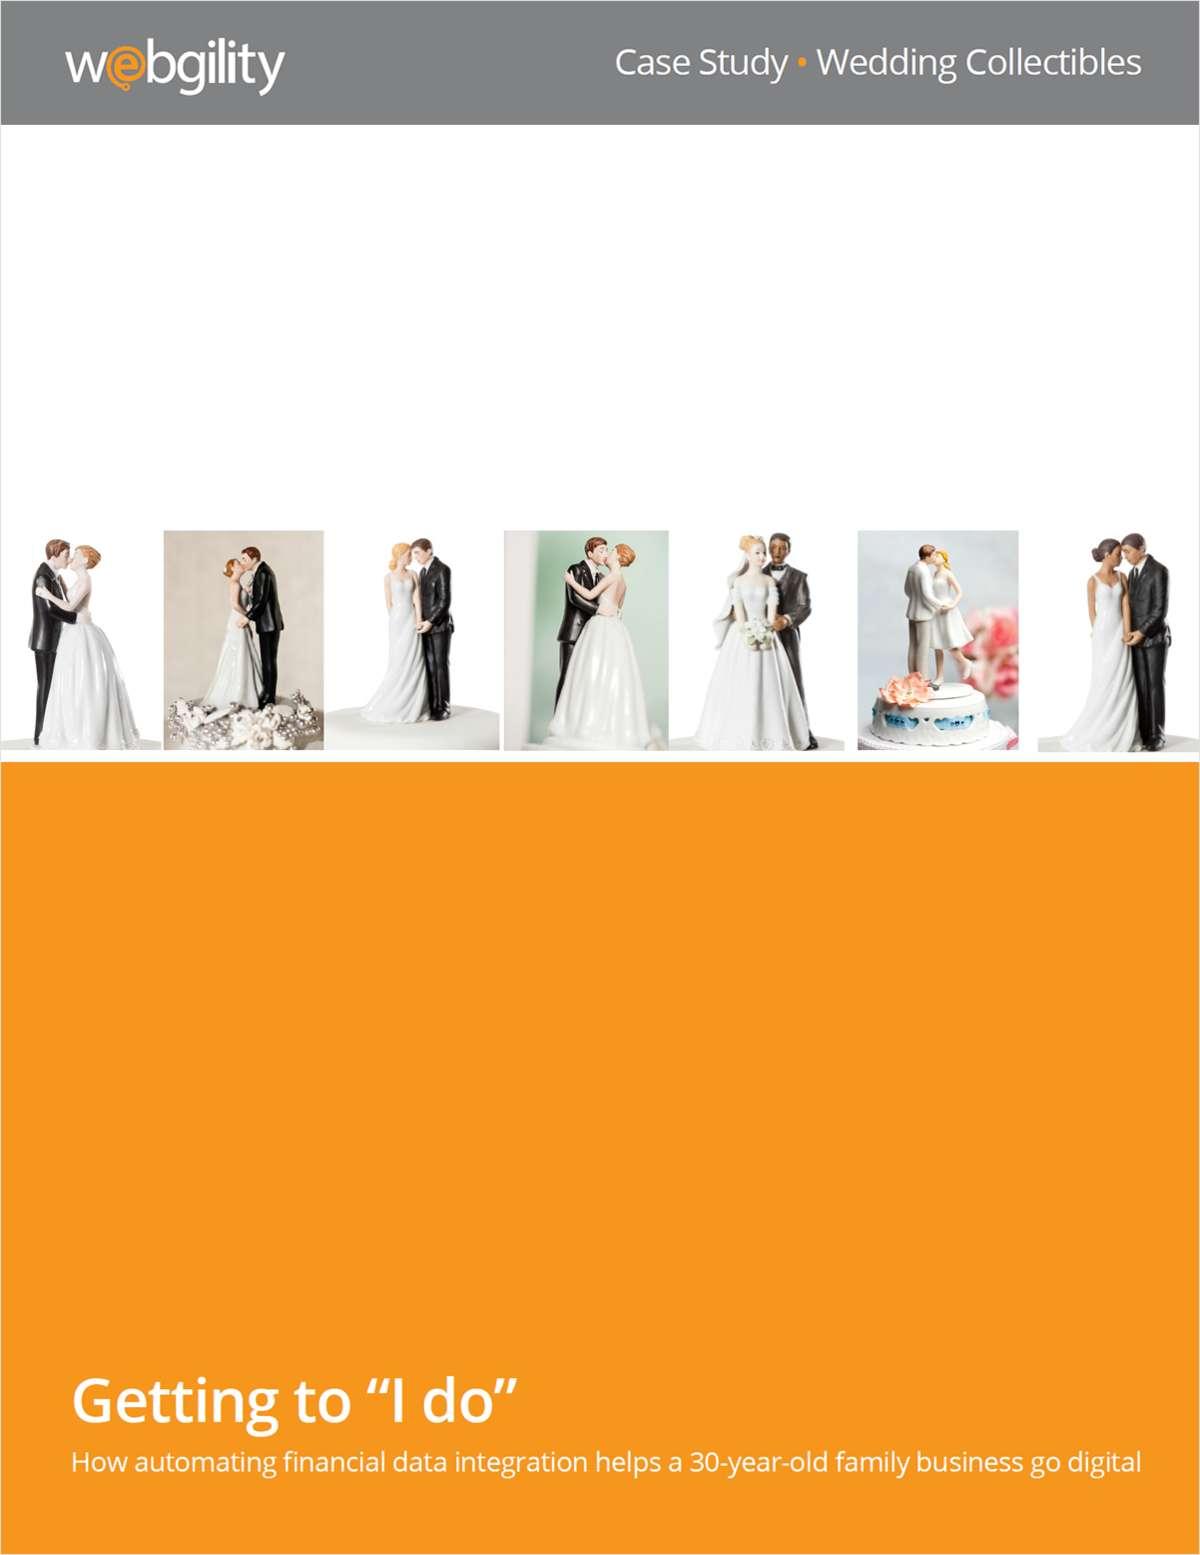 Wedding Collectibles Case Study:  Revenue increased 97%